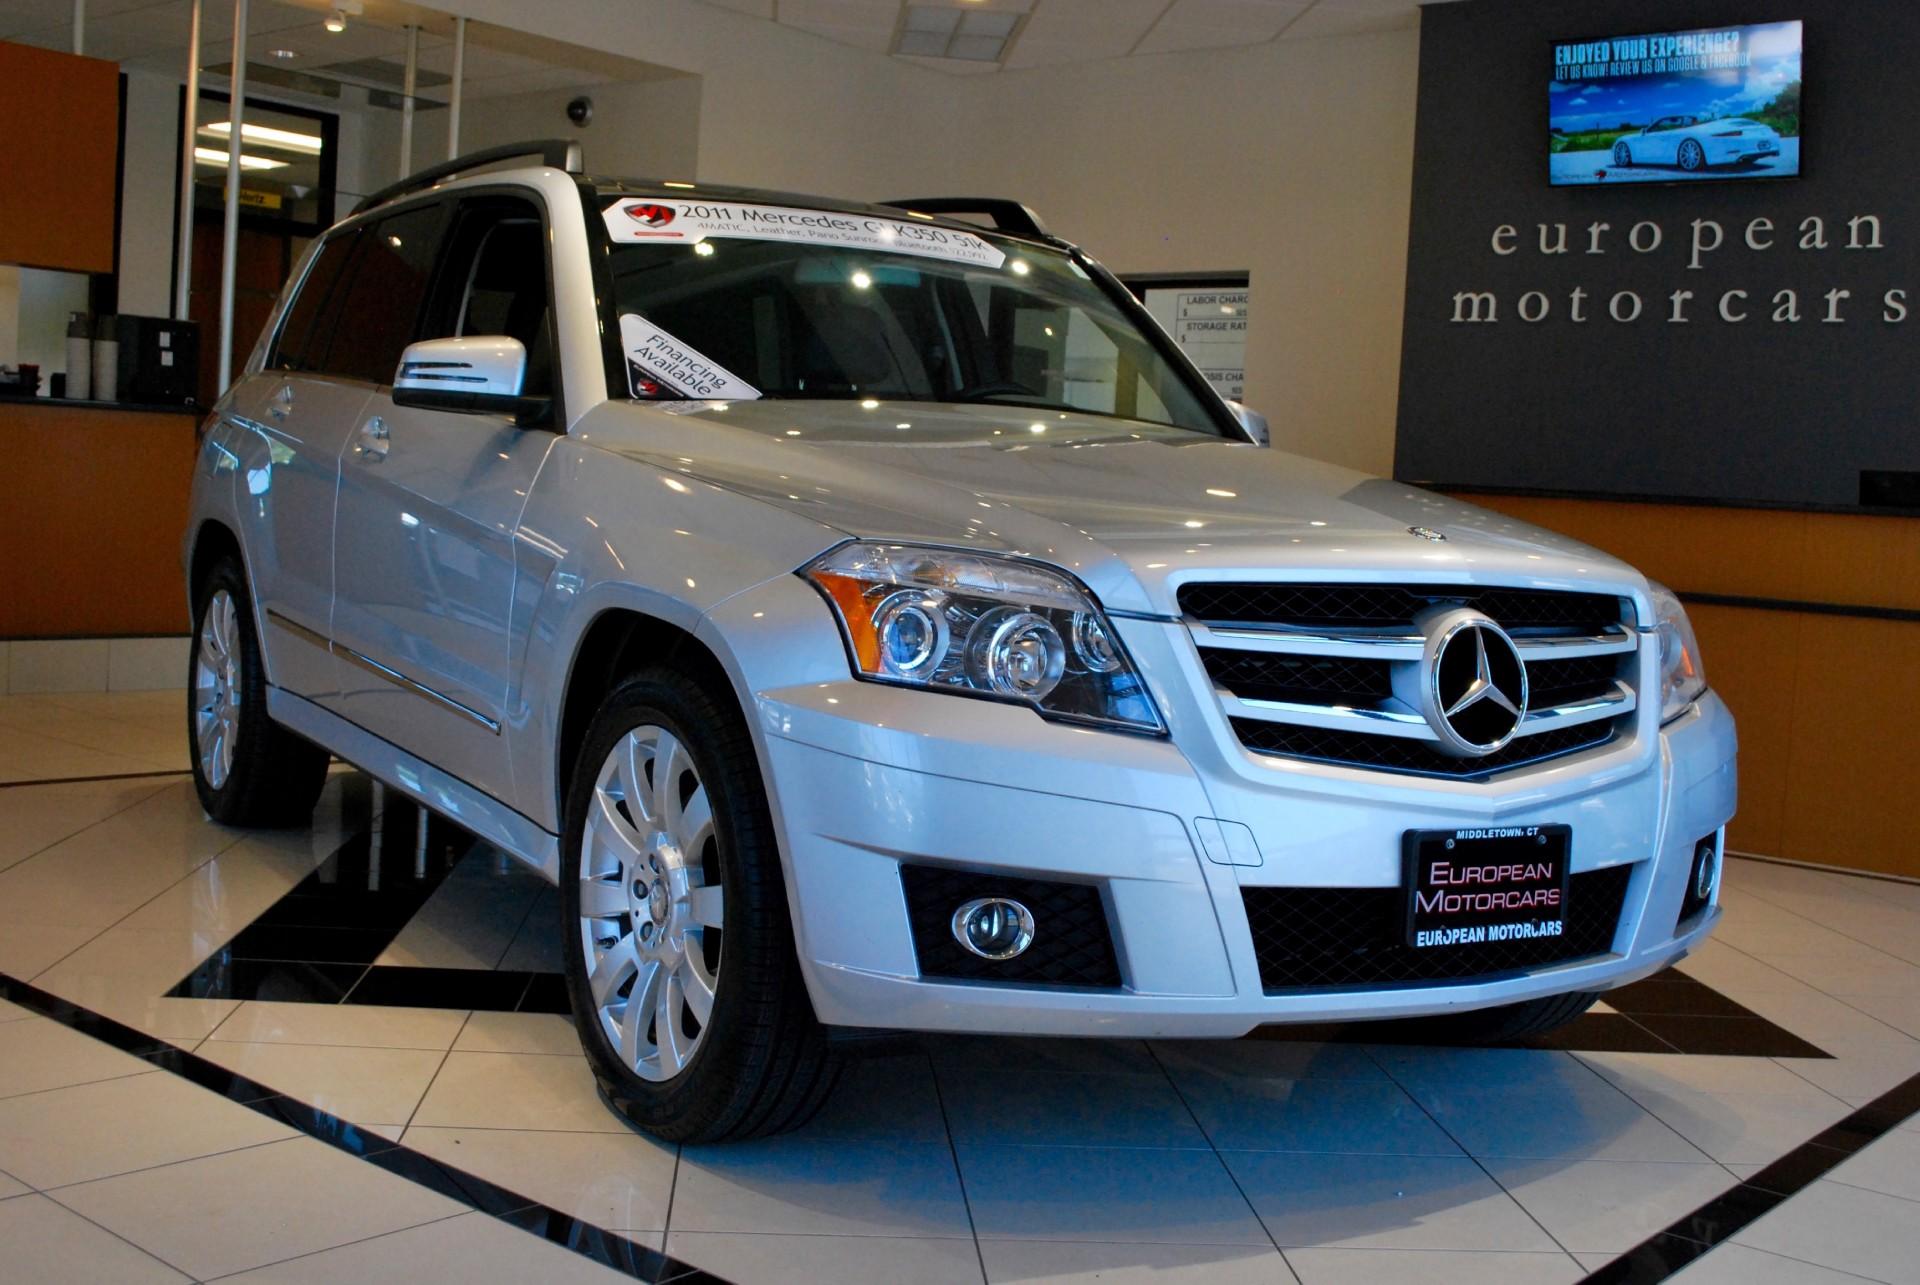 2011 mercedes benz glk glk350 4matic for sale near for Mercedes benz glk 2011